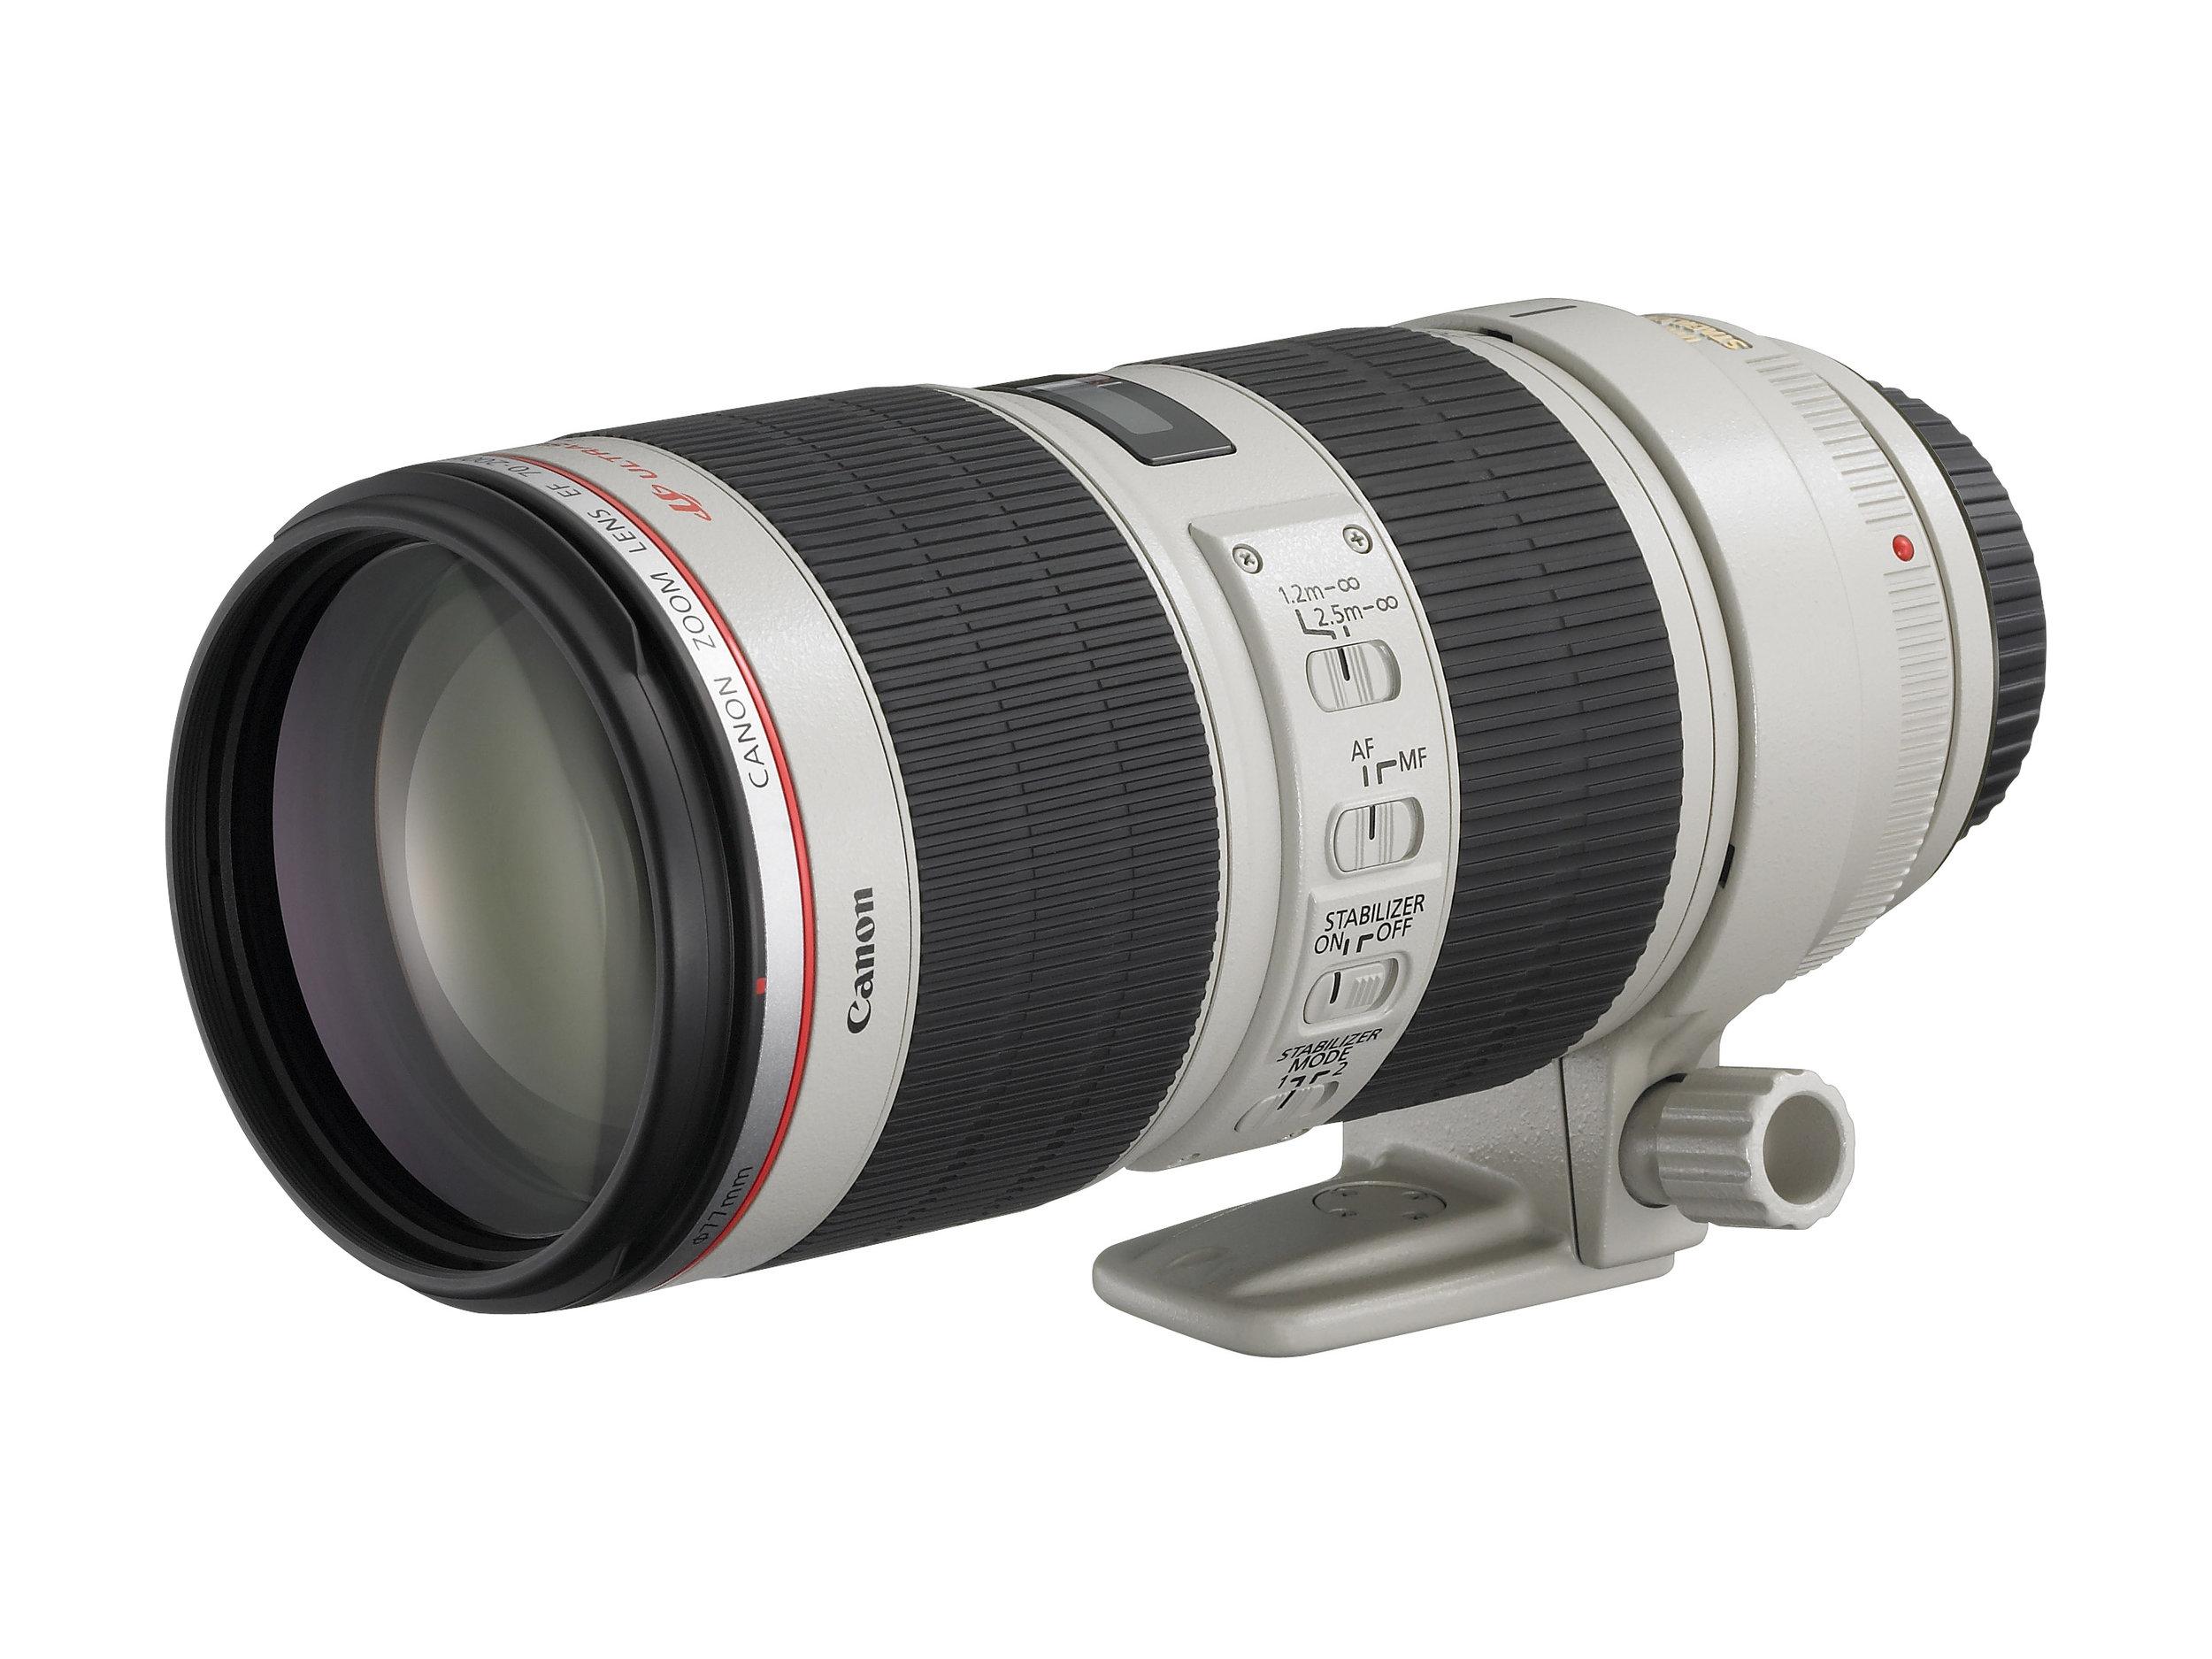 Canon_ZOOM_LENS_EF_70_200mm_F28L_IS_II_USM_.jpg